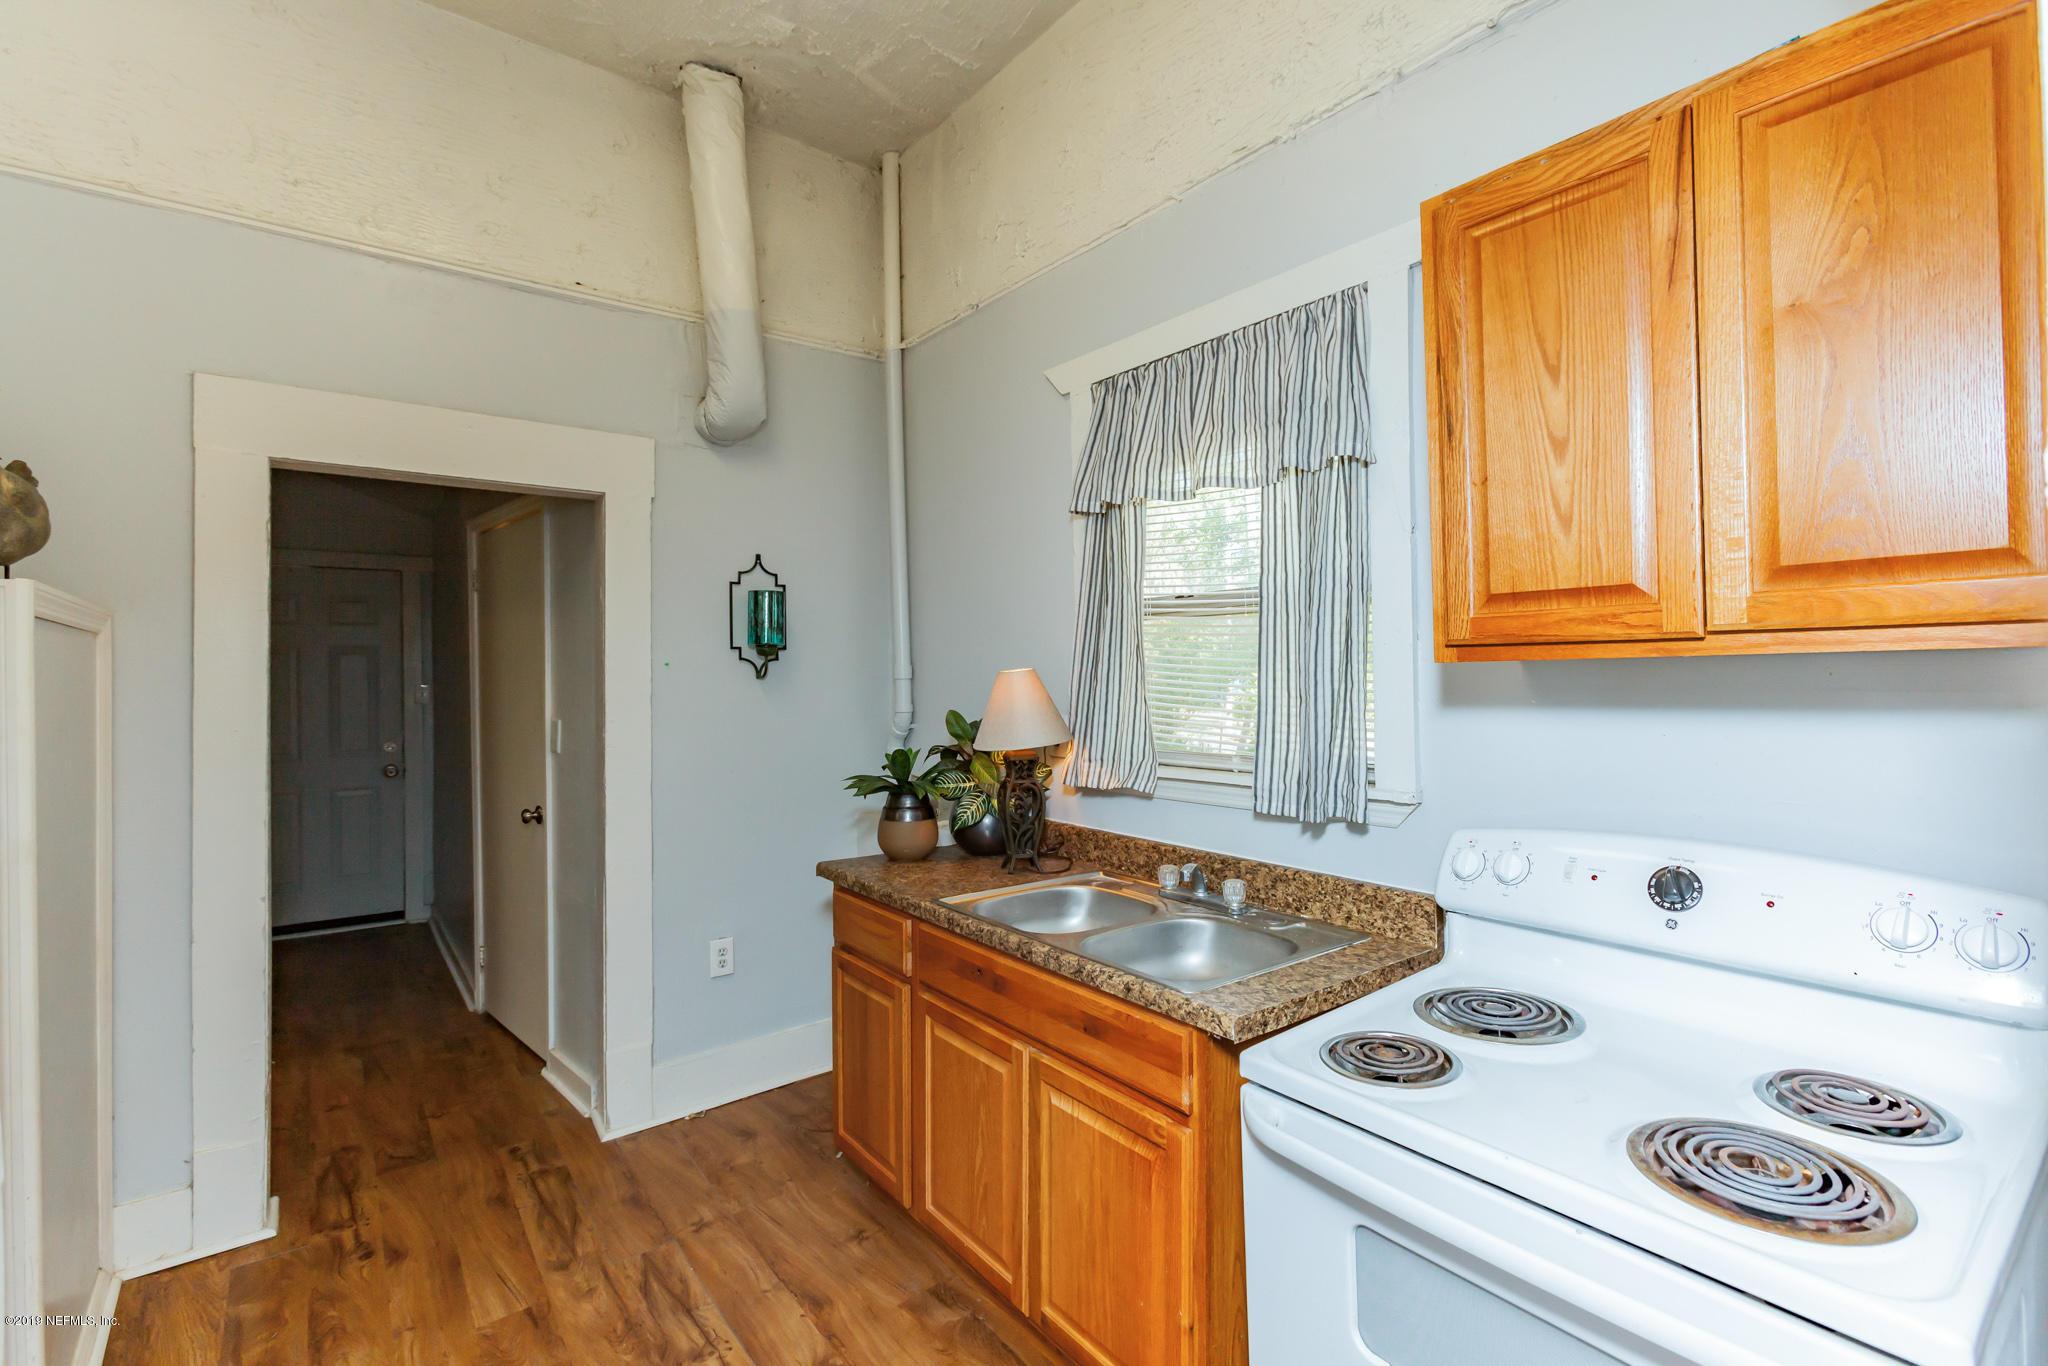 1480 MYRTLE, JACKSONVILLE, FLORIDA 32209, 2 Bedrooms Bedrooms, ,1 BathroomBathrooms,Residential,For sale,MYRTLE,1088788